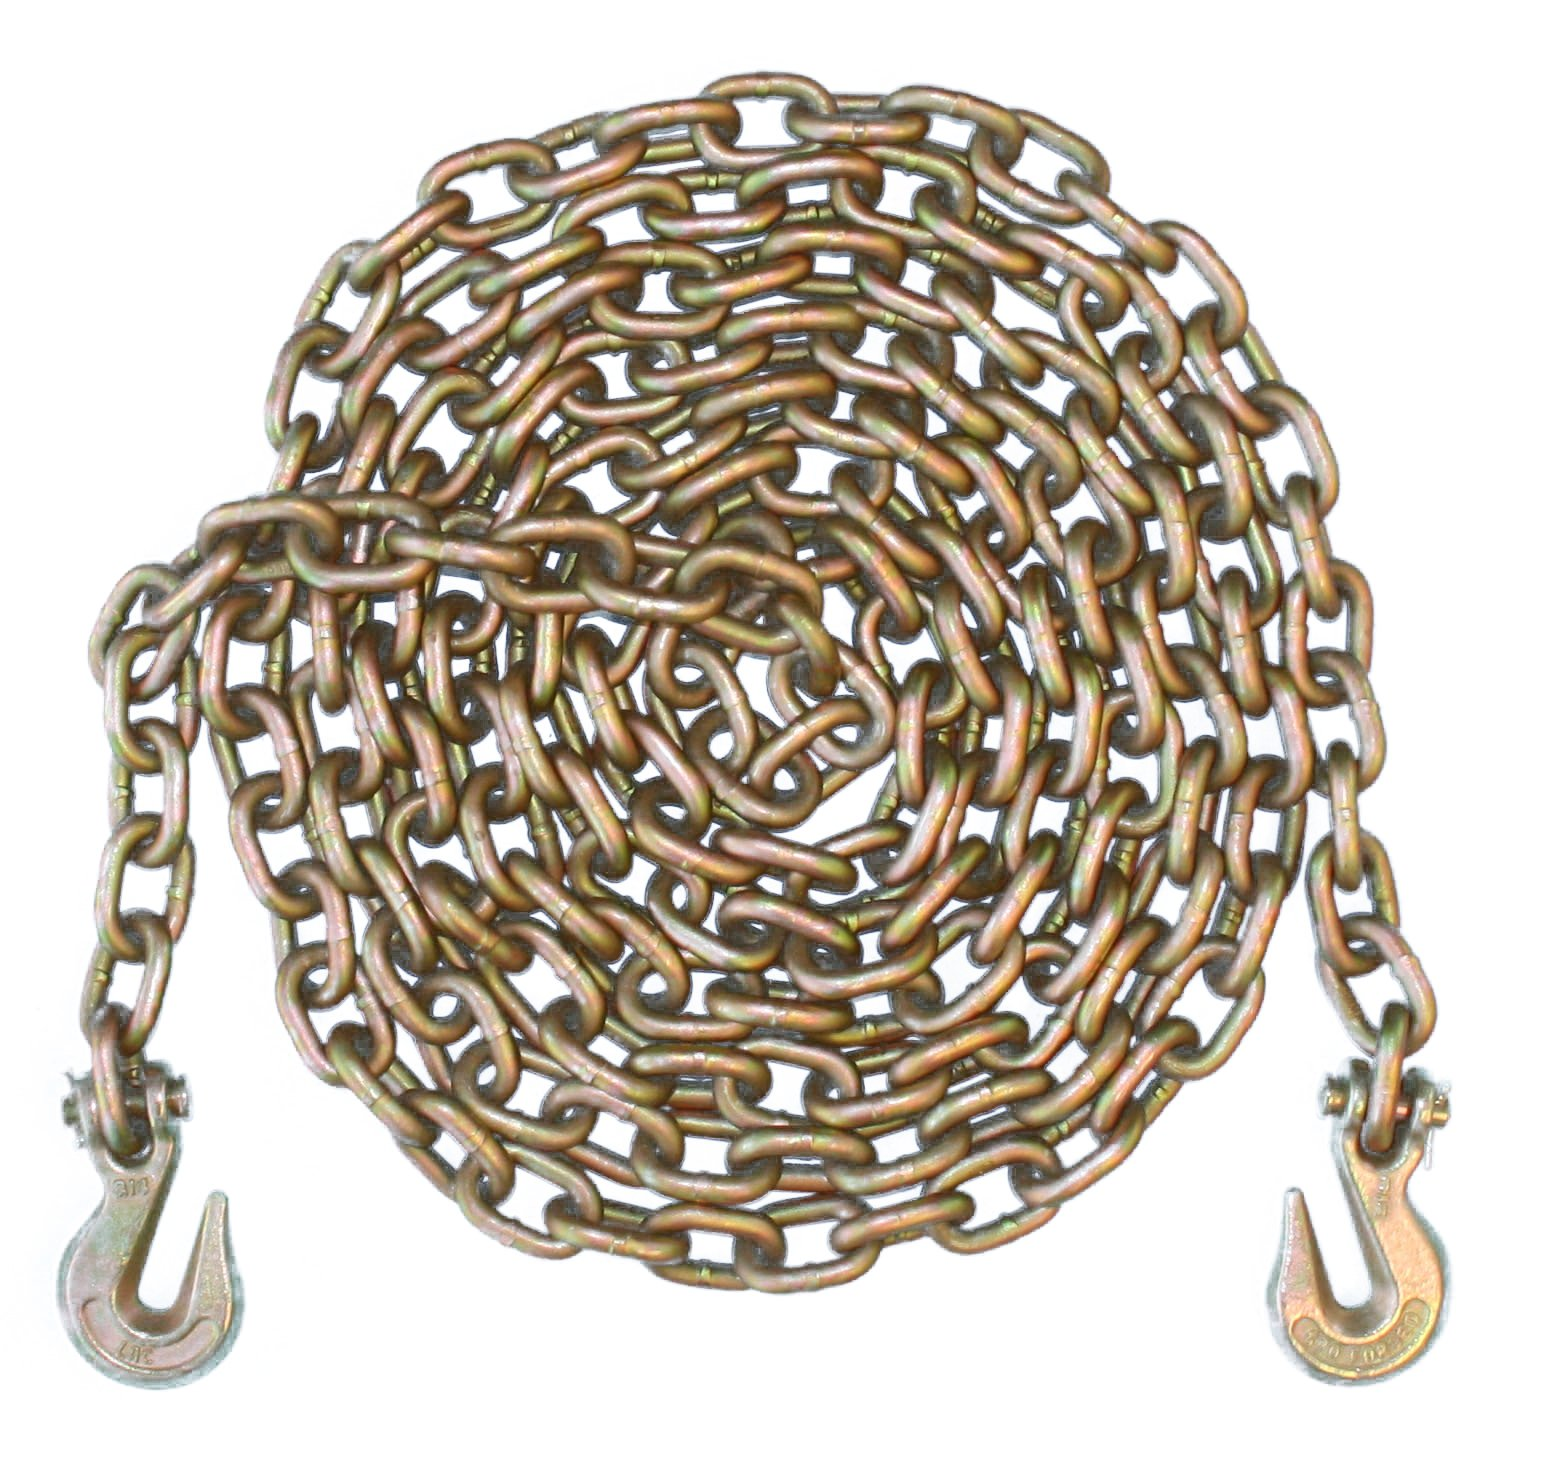 5/16'' 10' Foot Grade 70 Binder Chain - Transport Hauling Load Package for Trailer Load